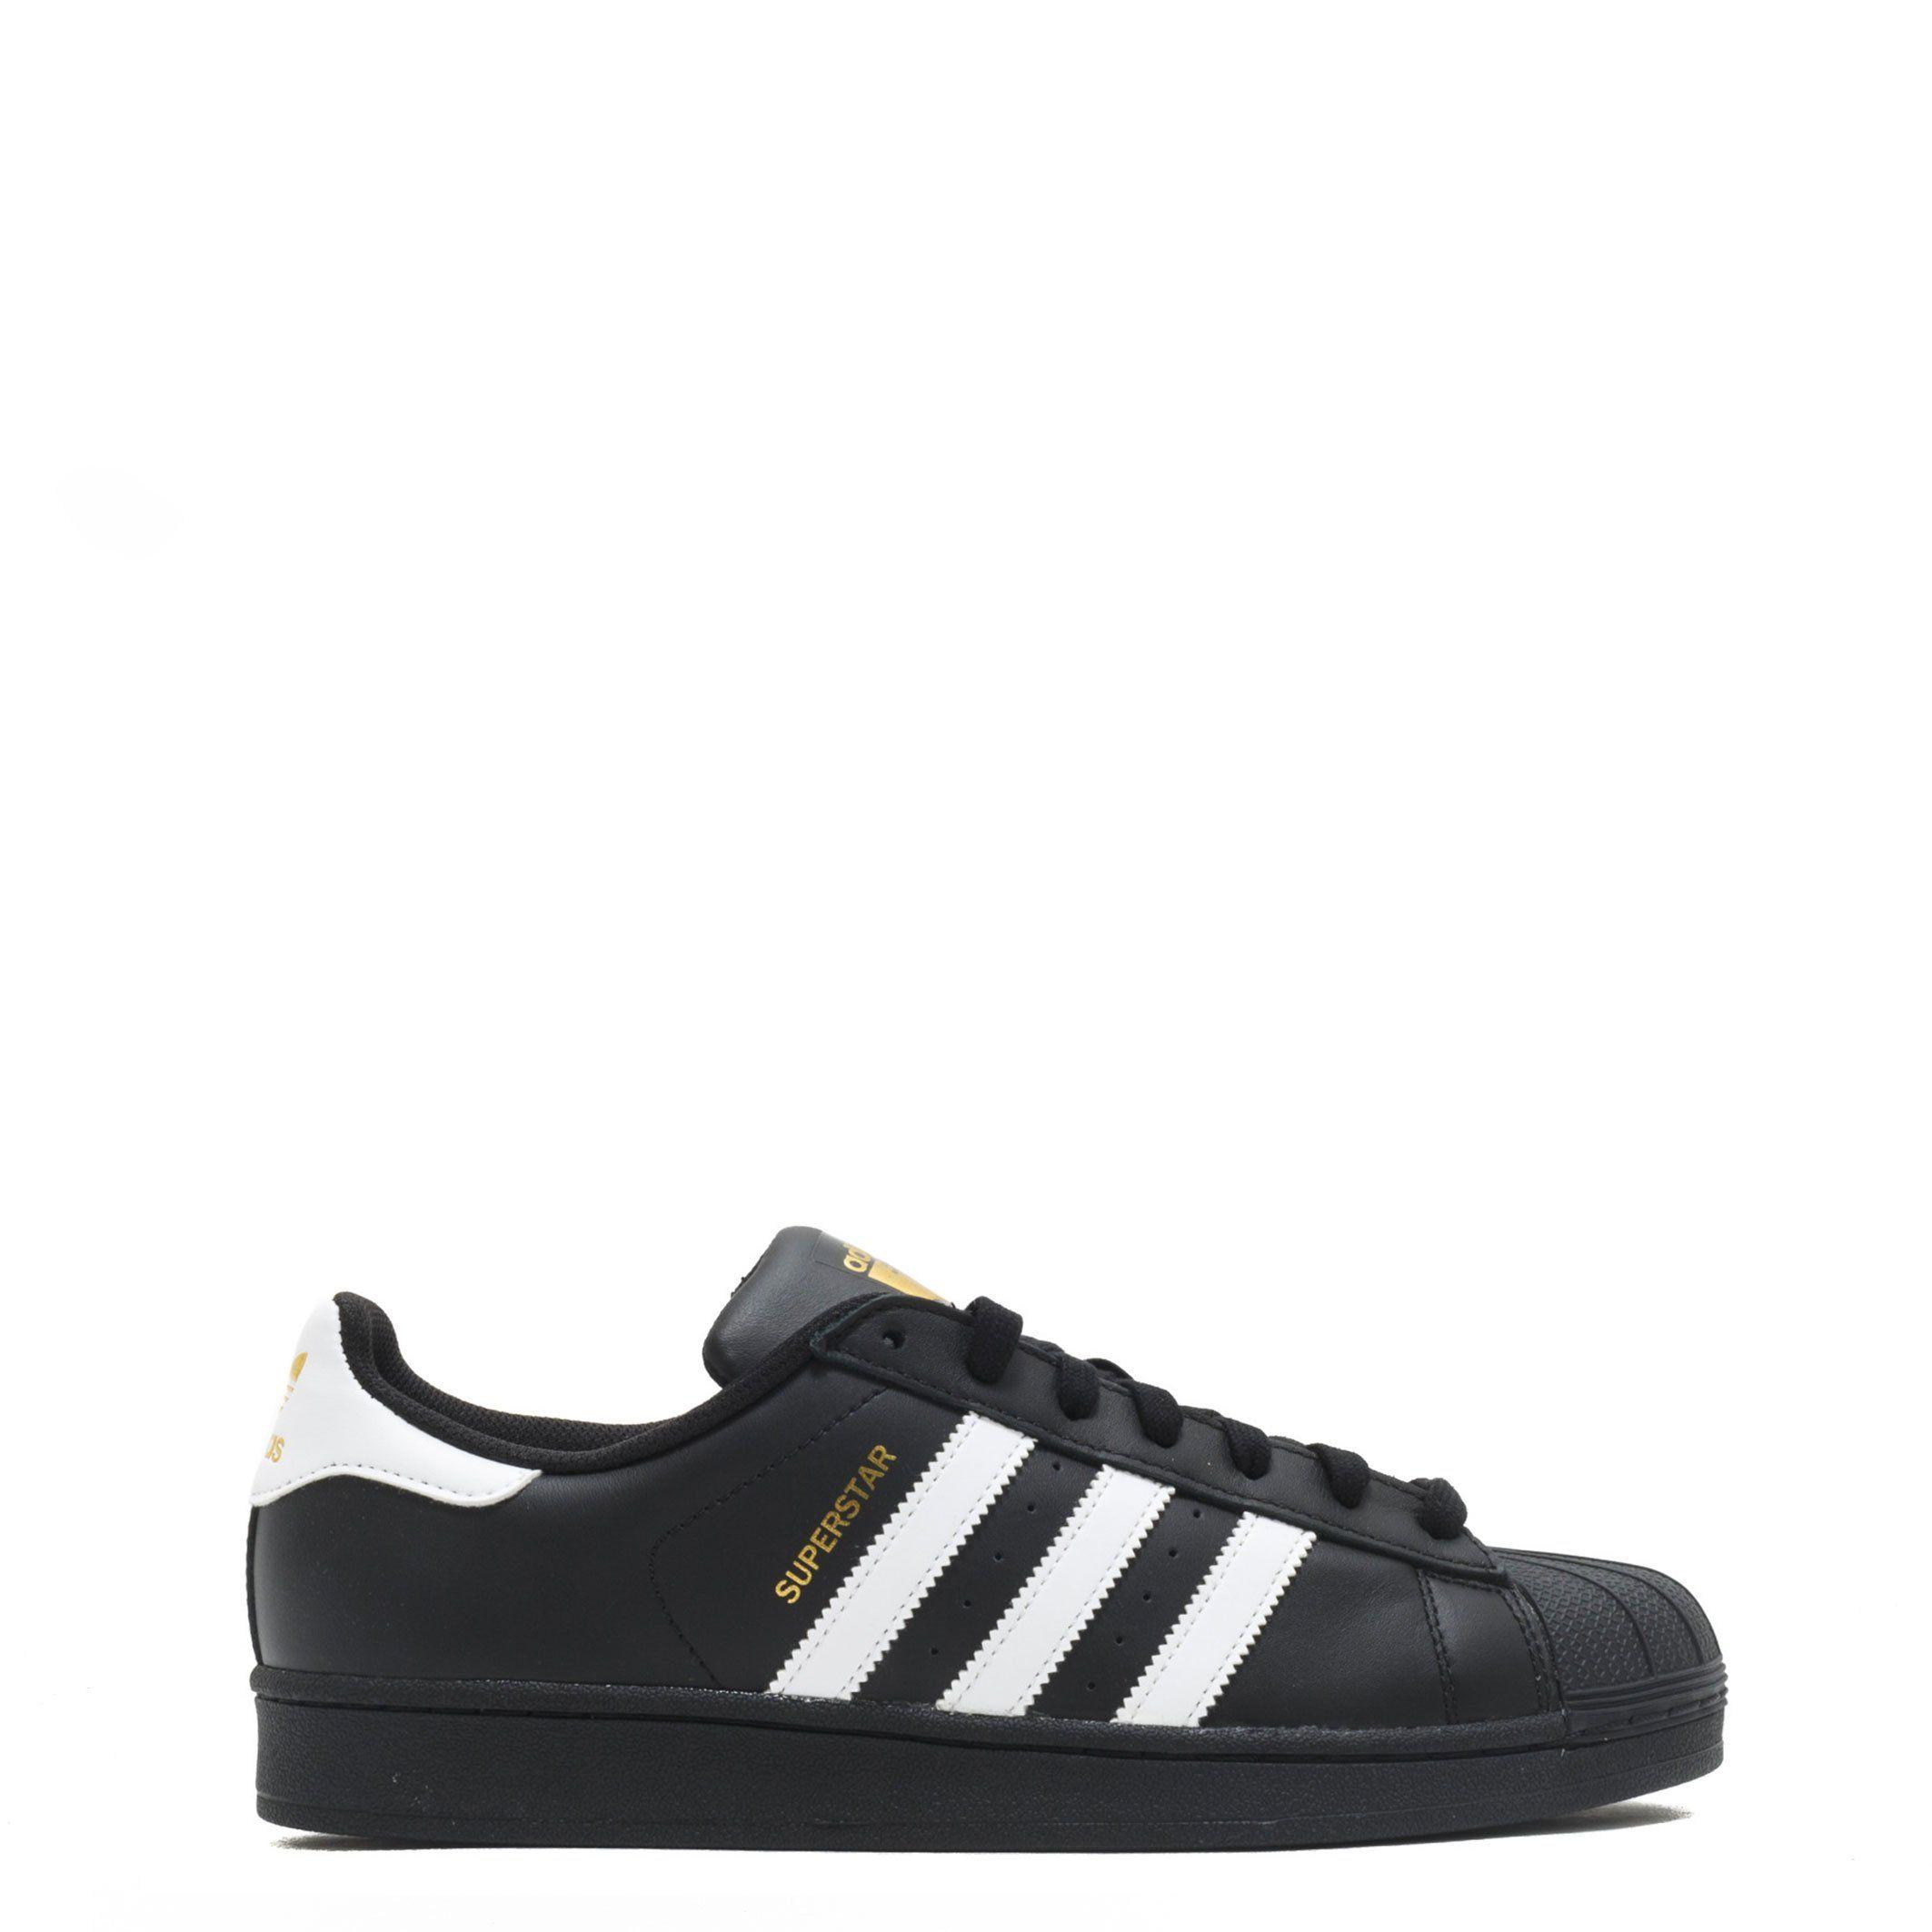 new concept 0869e 8885c Adidas Superstar Black and White